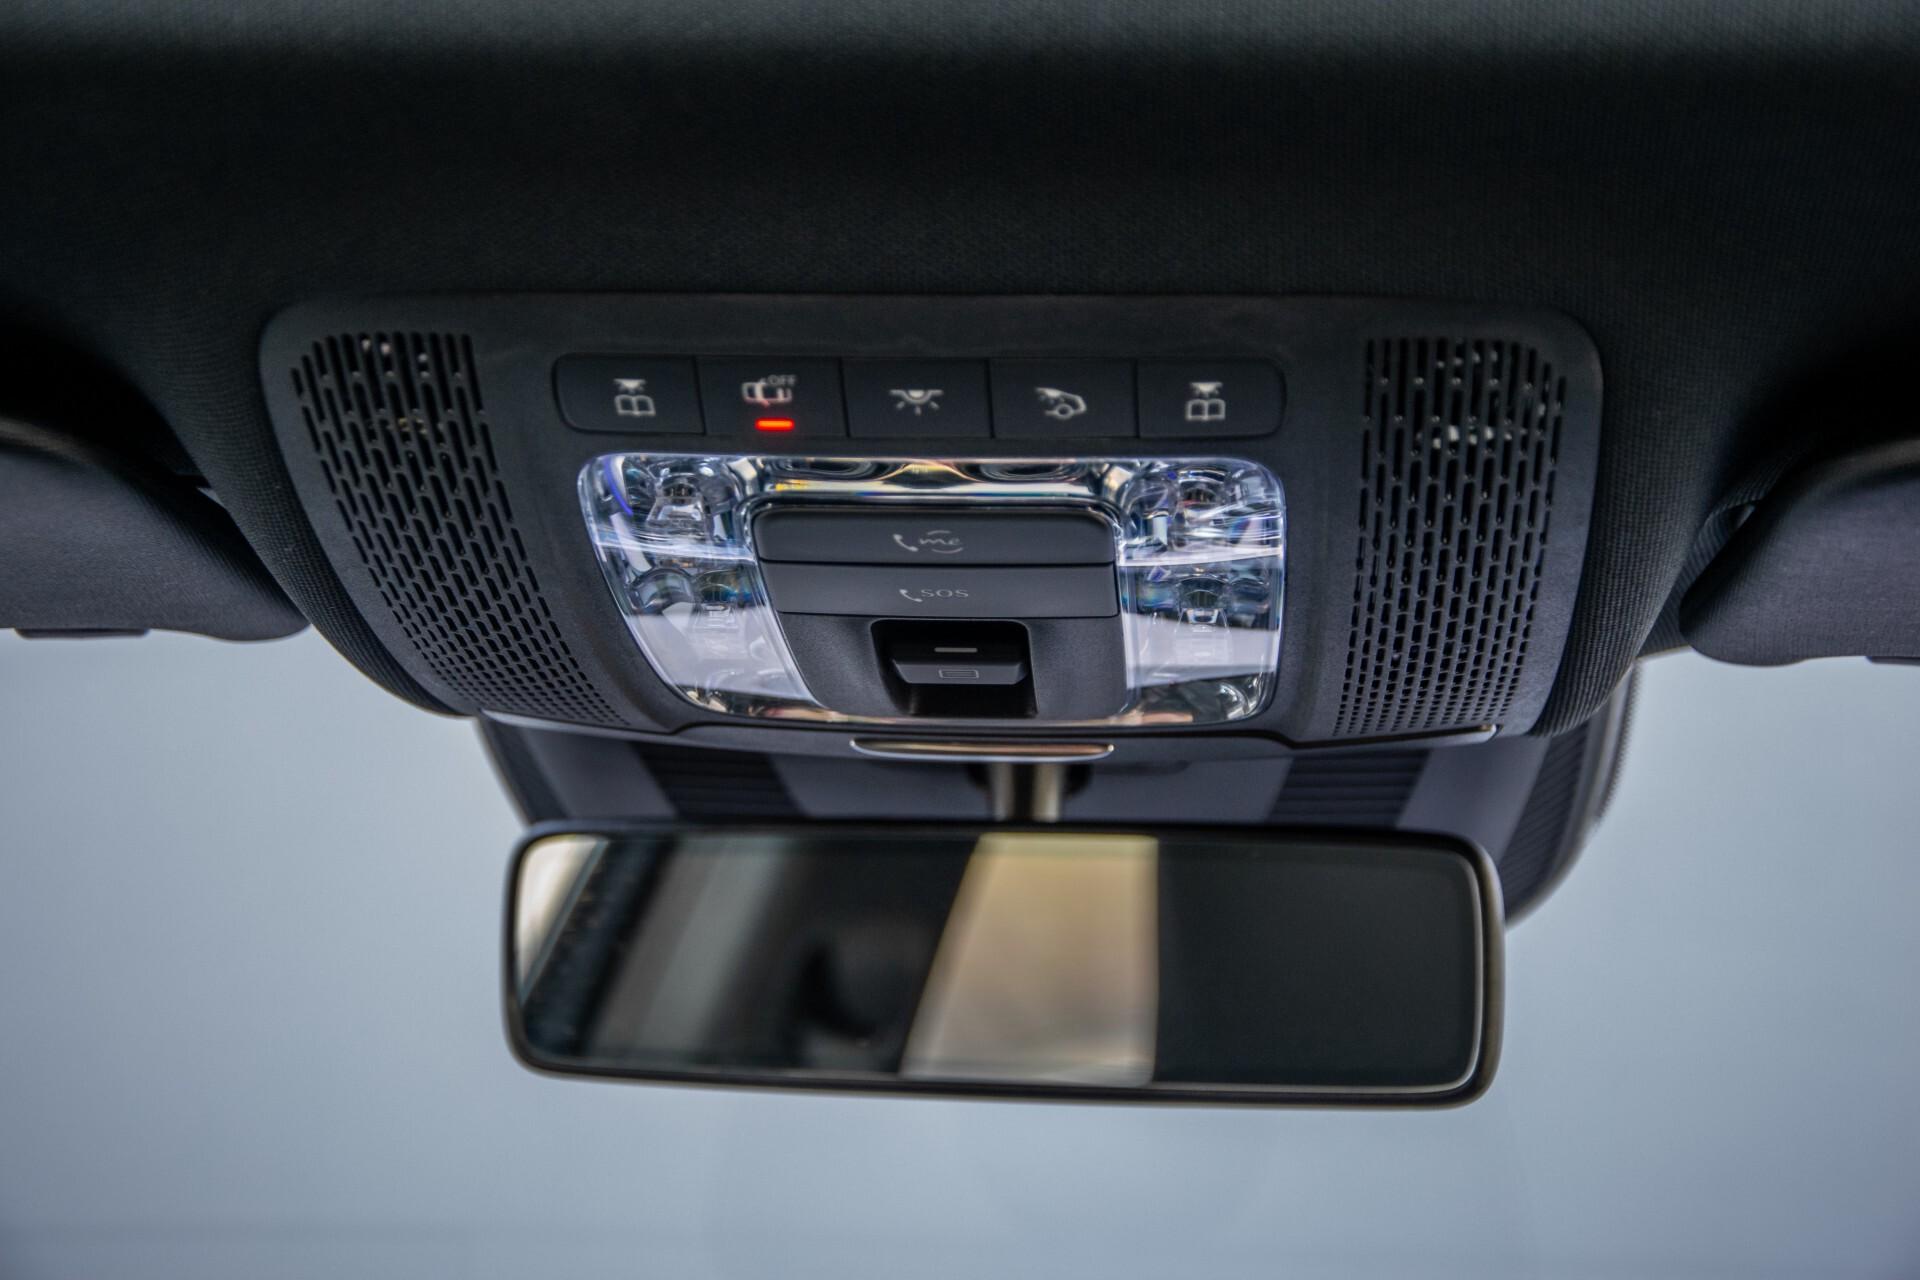 Mercedes-Benz A-Klasse 250 4-M AMG Panorama/Keyless-Entry/MBUX/HUD/Burmester/360/Multibeam LED Aut7 Foto 50